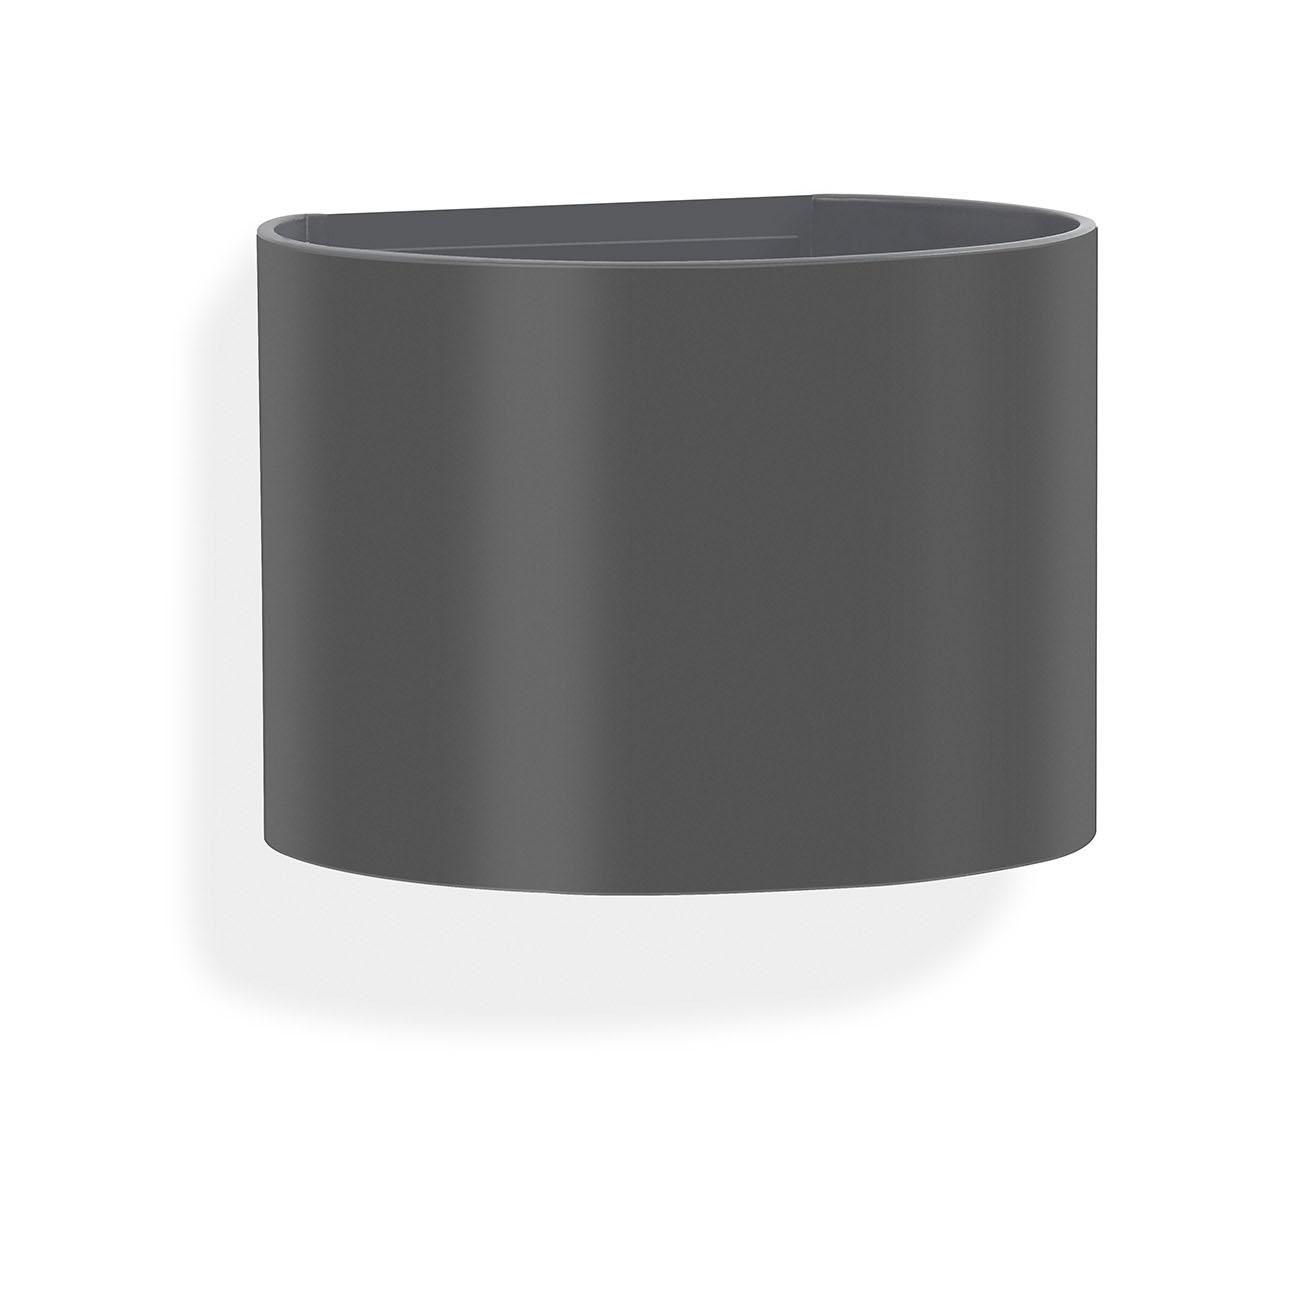 TELEFUNKEN LED Aussenleuchte, 14 cm, 7 W, Anthrazit